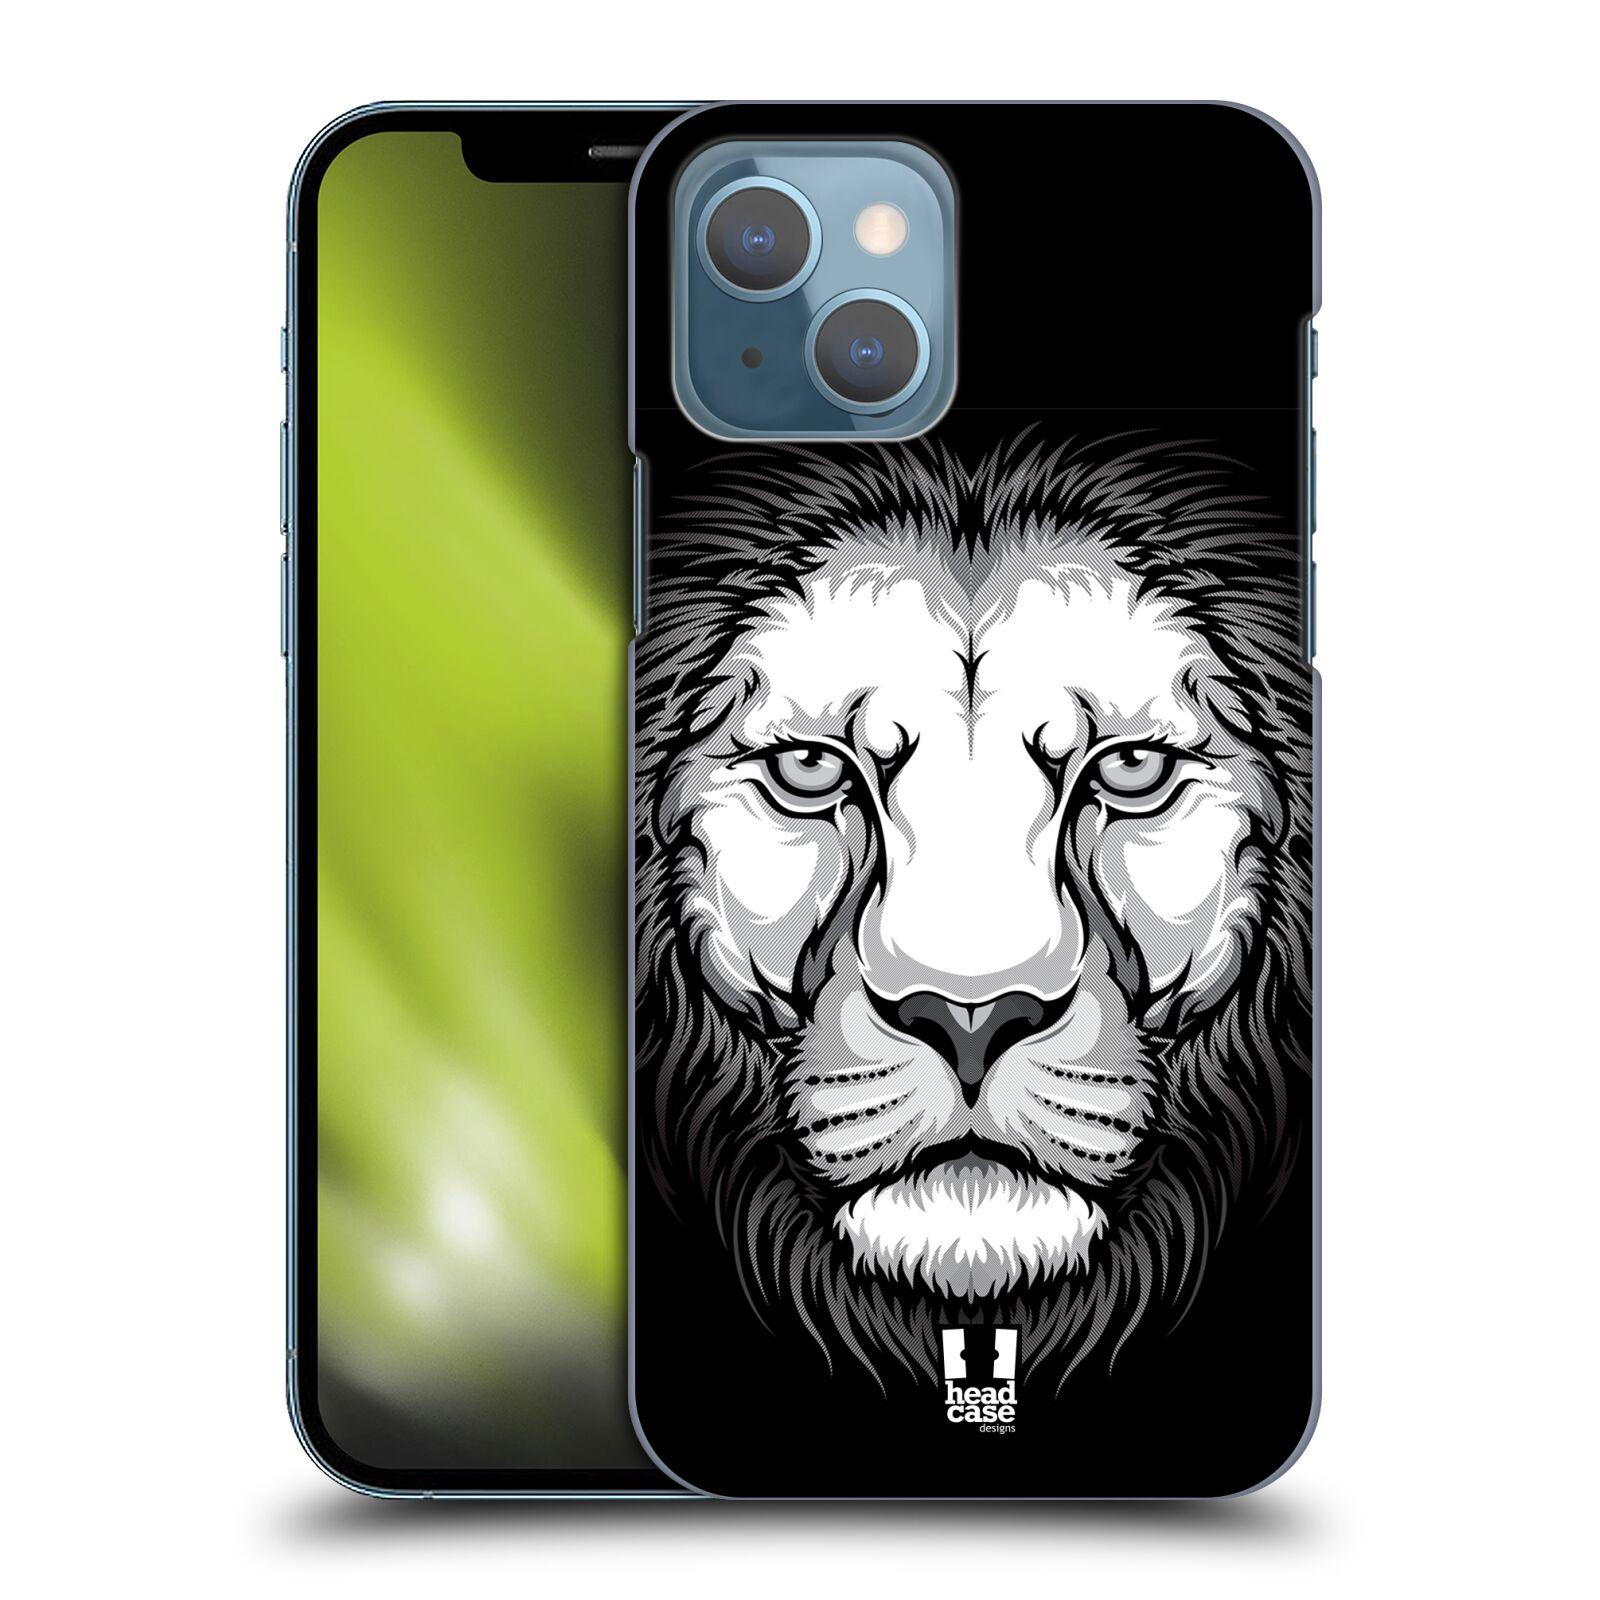 Plastové pouzdro na mobil Apple iPhone 13 - Head Case - ILUSTROVANÝ LEV